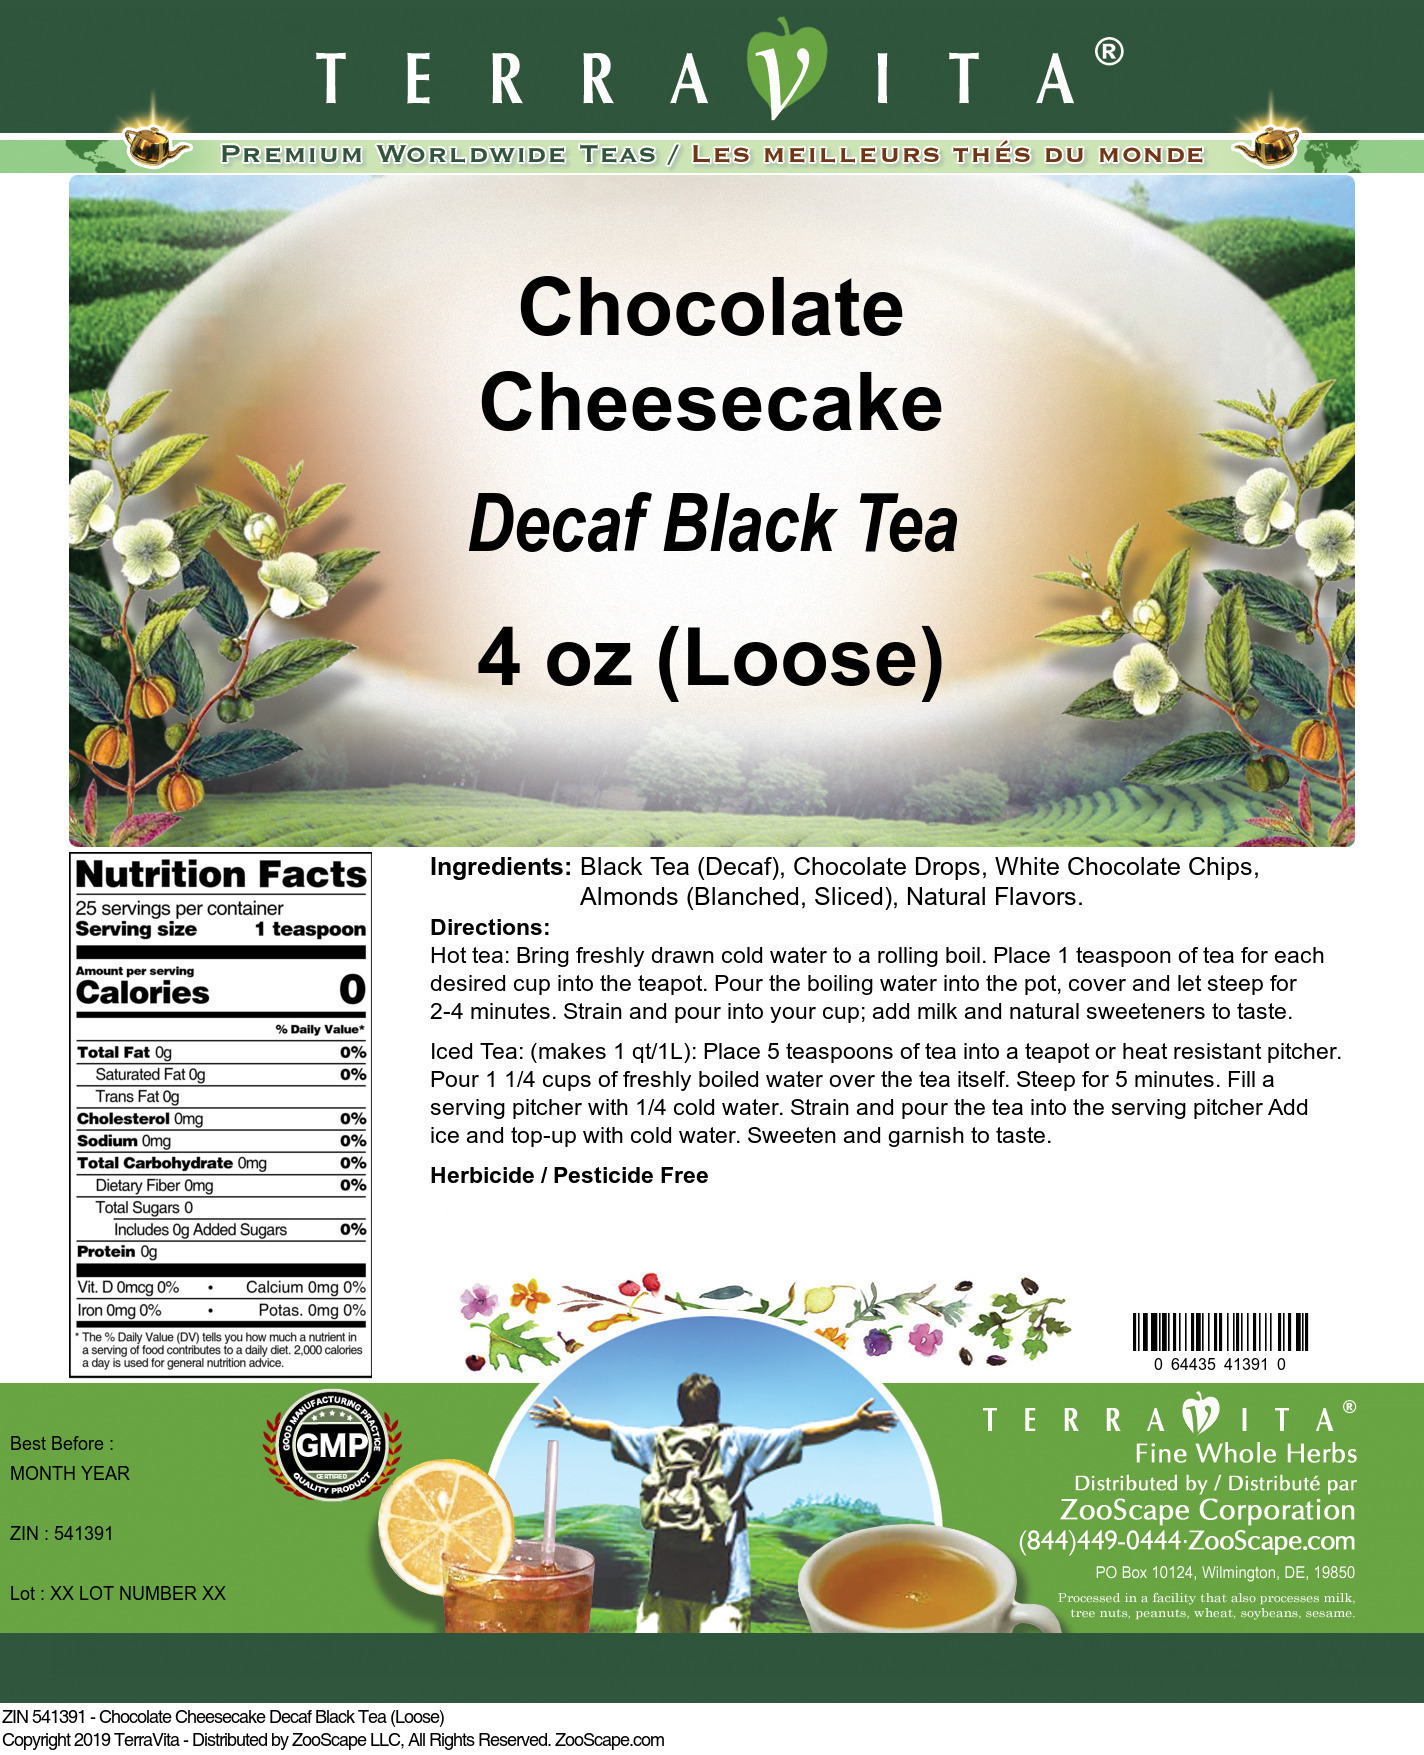 Chocolate Cheesecake Decaf Black Tea